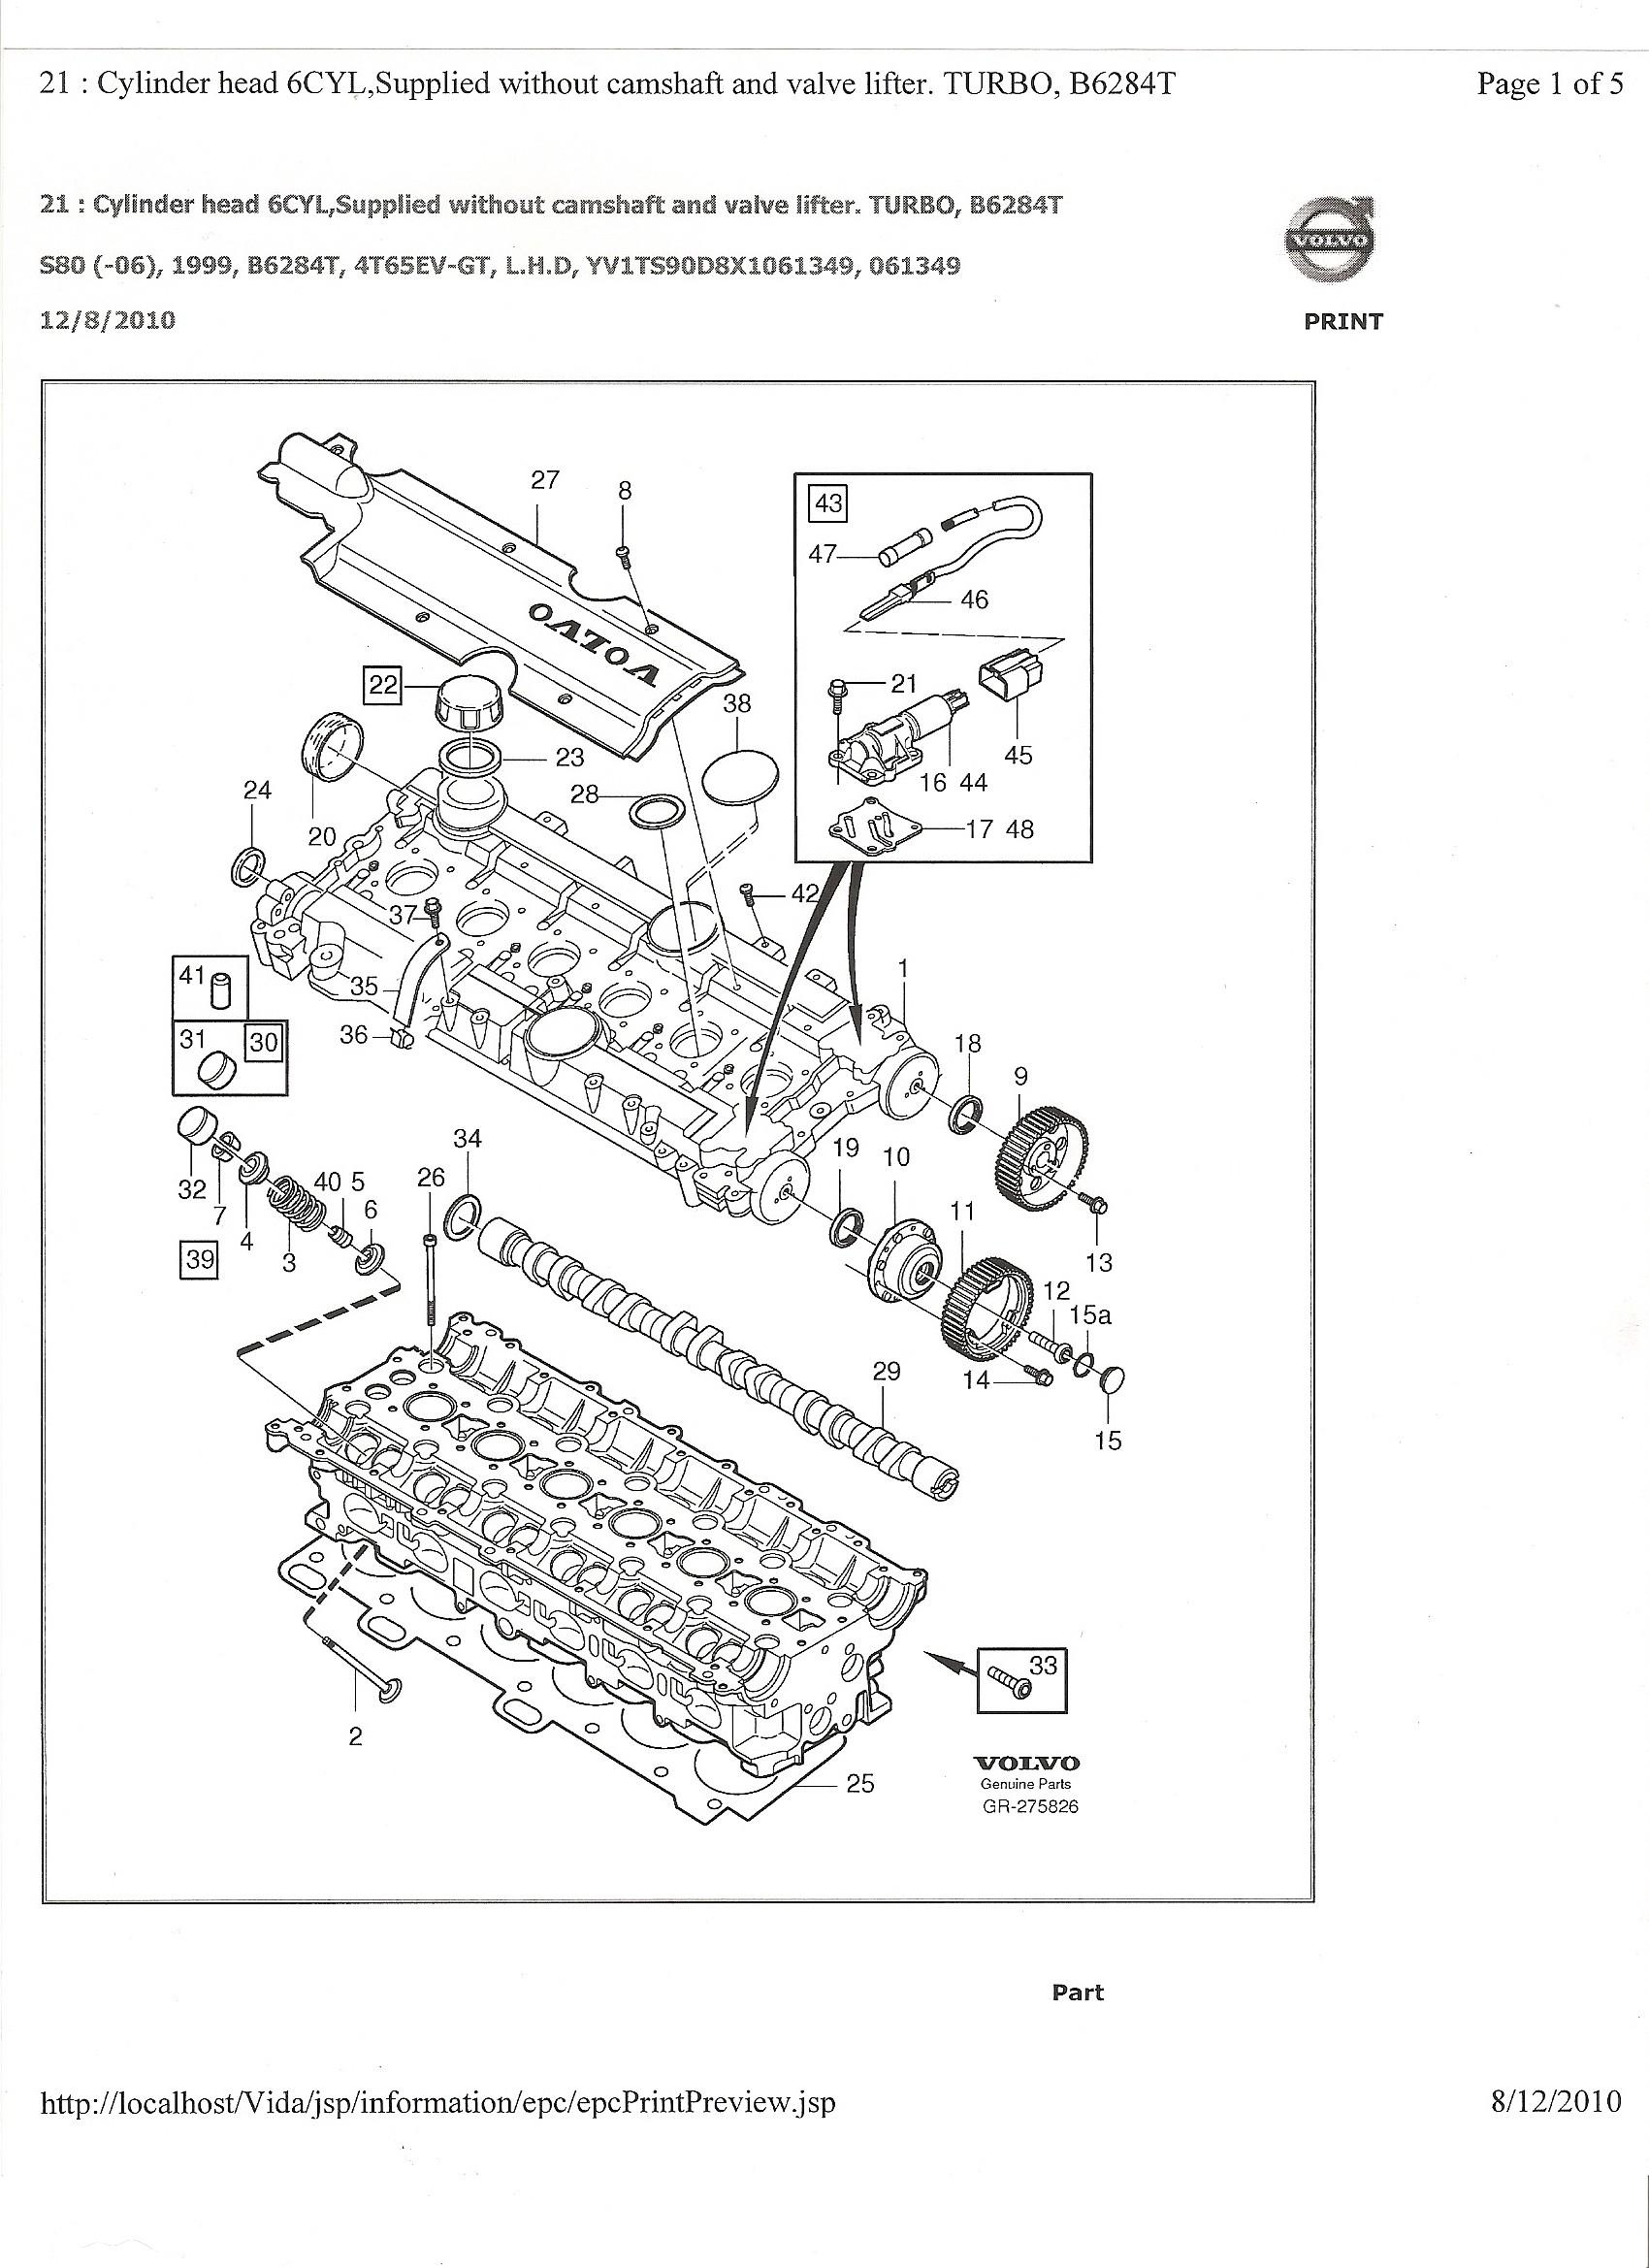 Volvo S80 T6 Complete Engine Wiring 1999 Volvo S80 Engine Diagram Diagram In Database 1999 Volvo S80 Engine Diagram Just Of Volvo S80 T6 Complete Engine Wiring